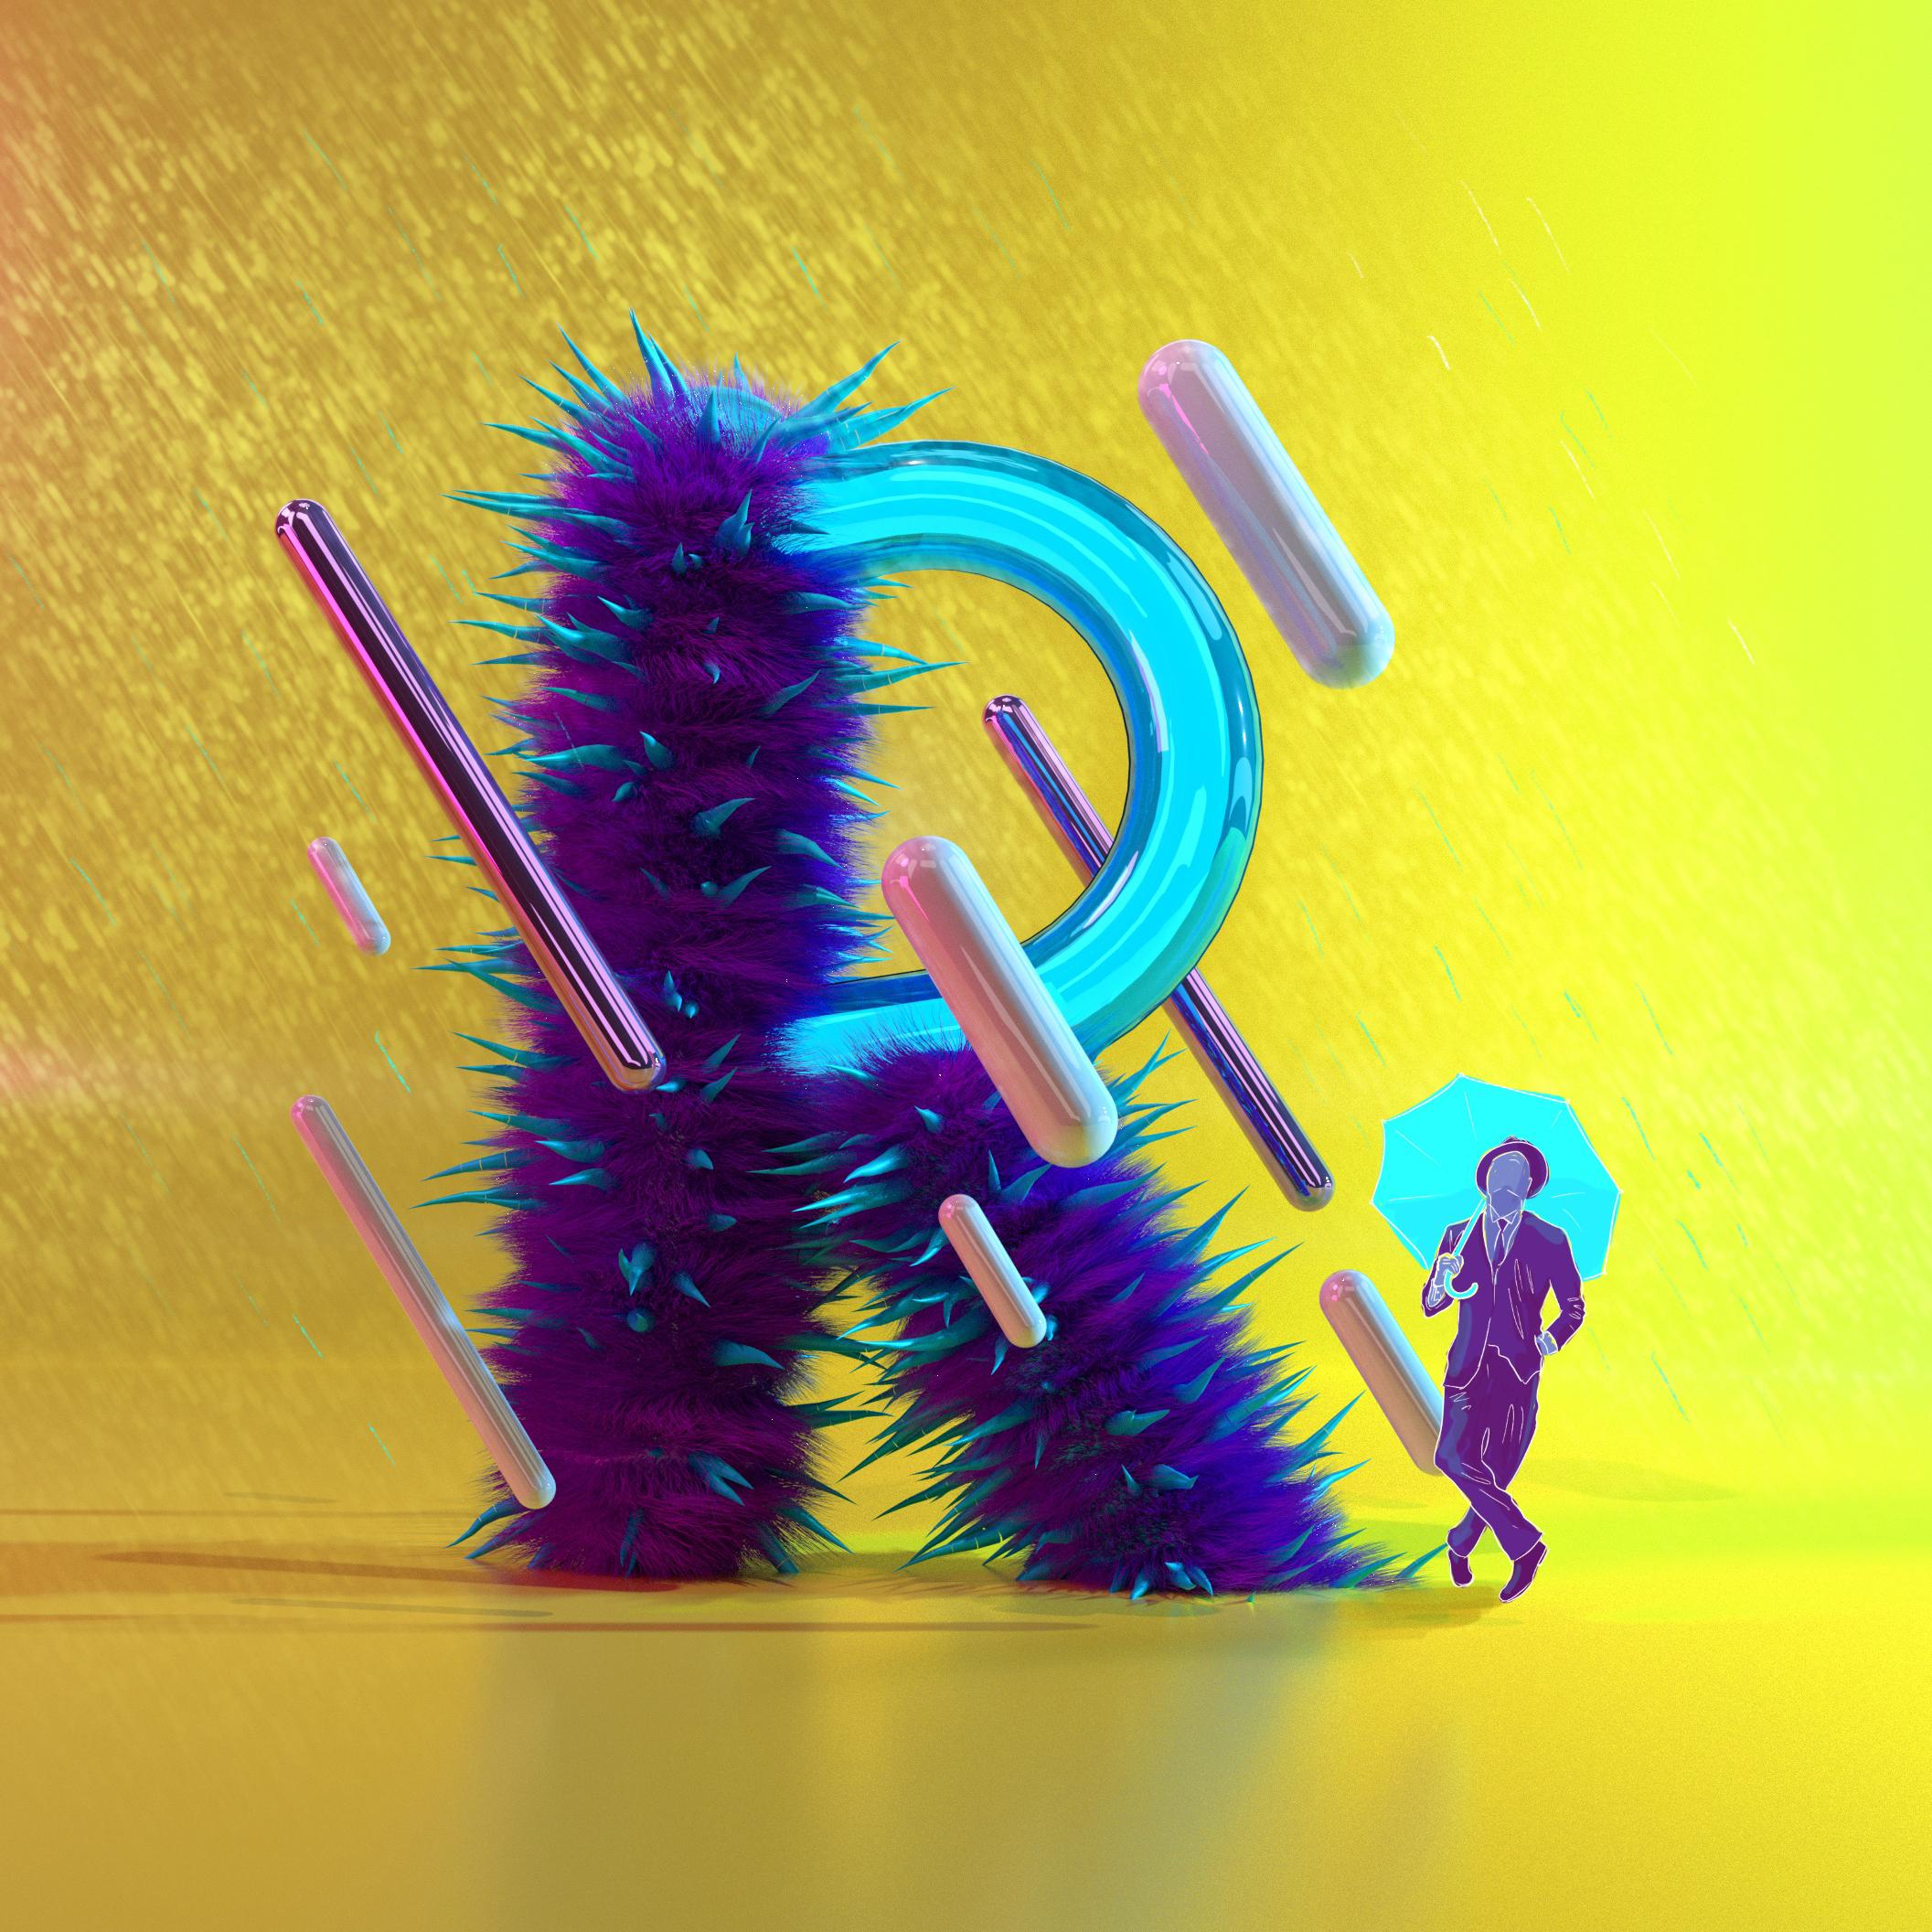 chris-winterton-R-typography-3D-36daysoftype.jpg